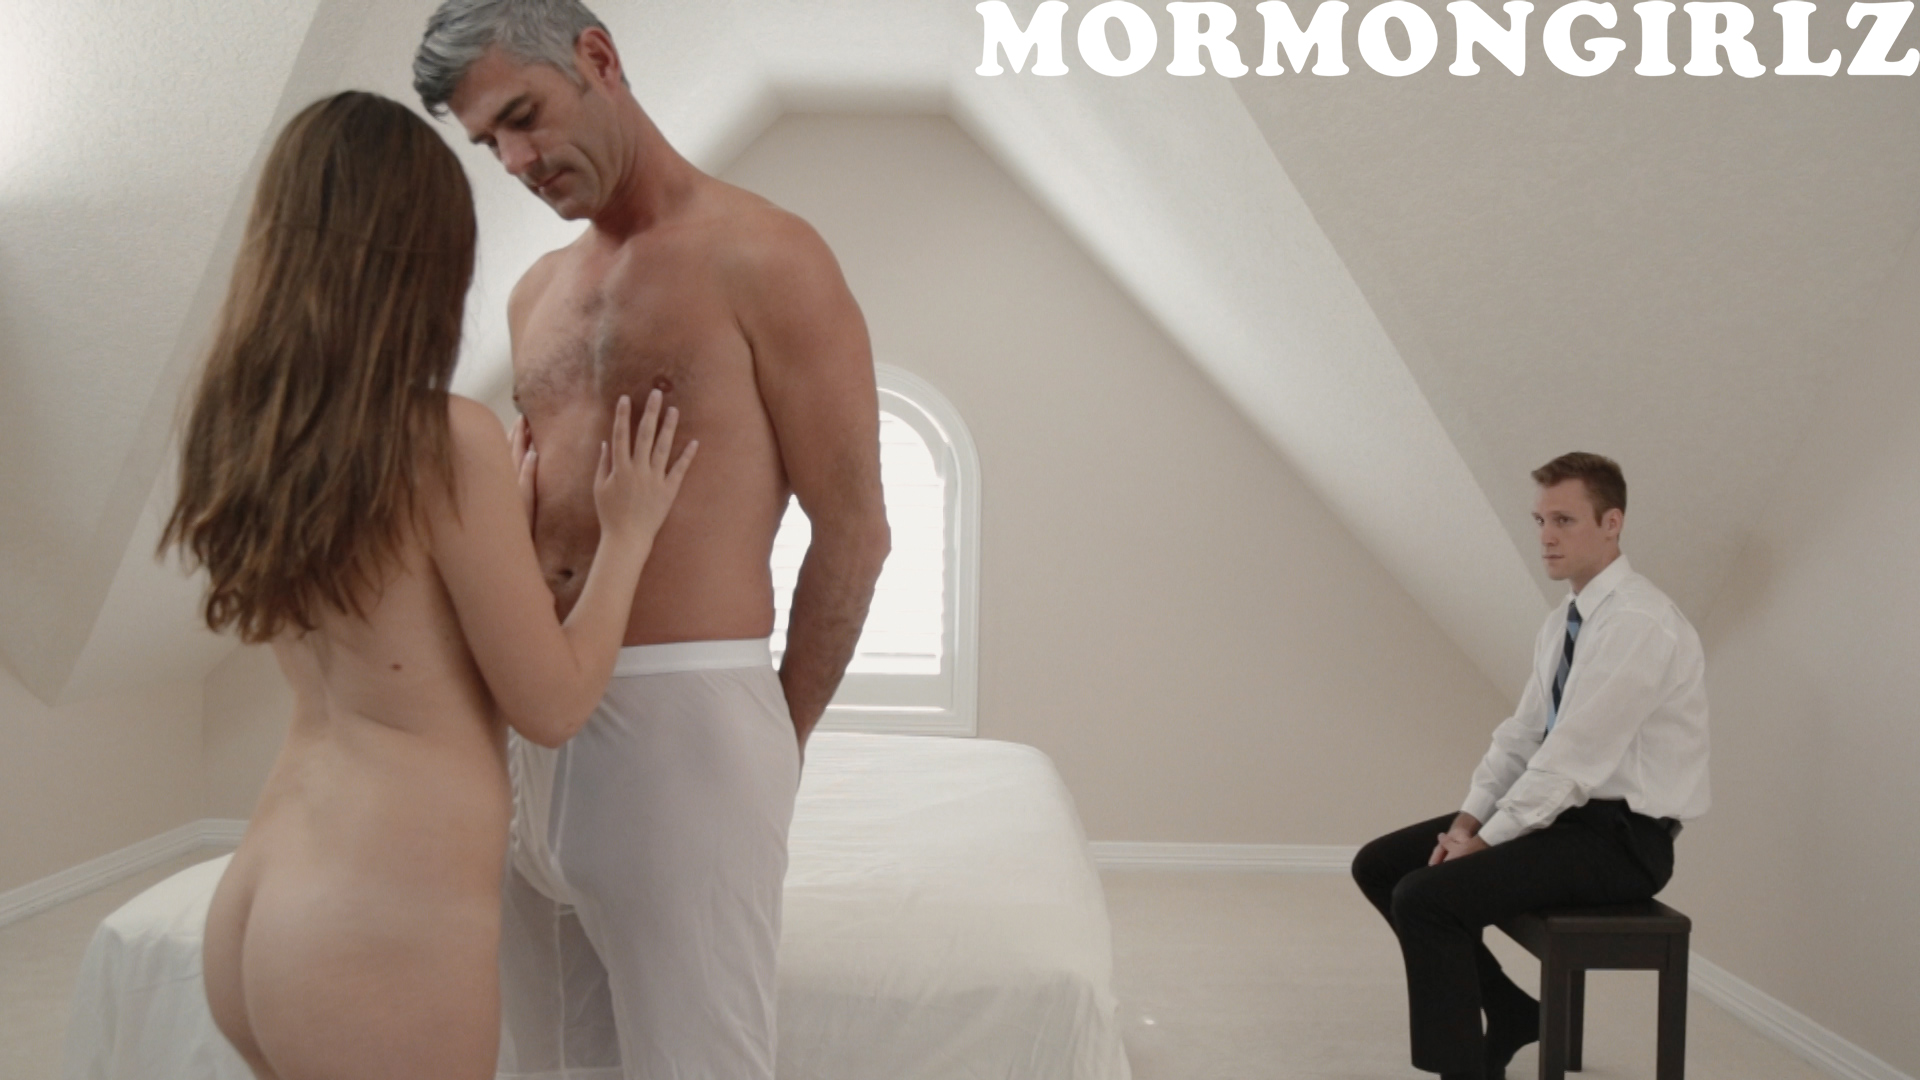 076_mormongirlz_0024